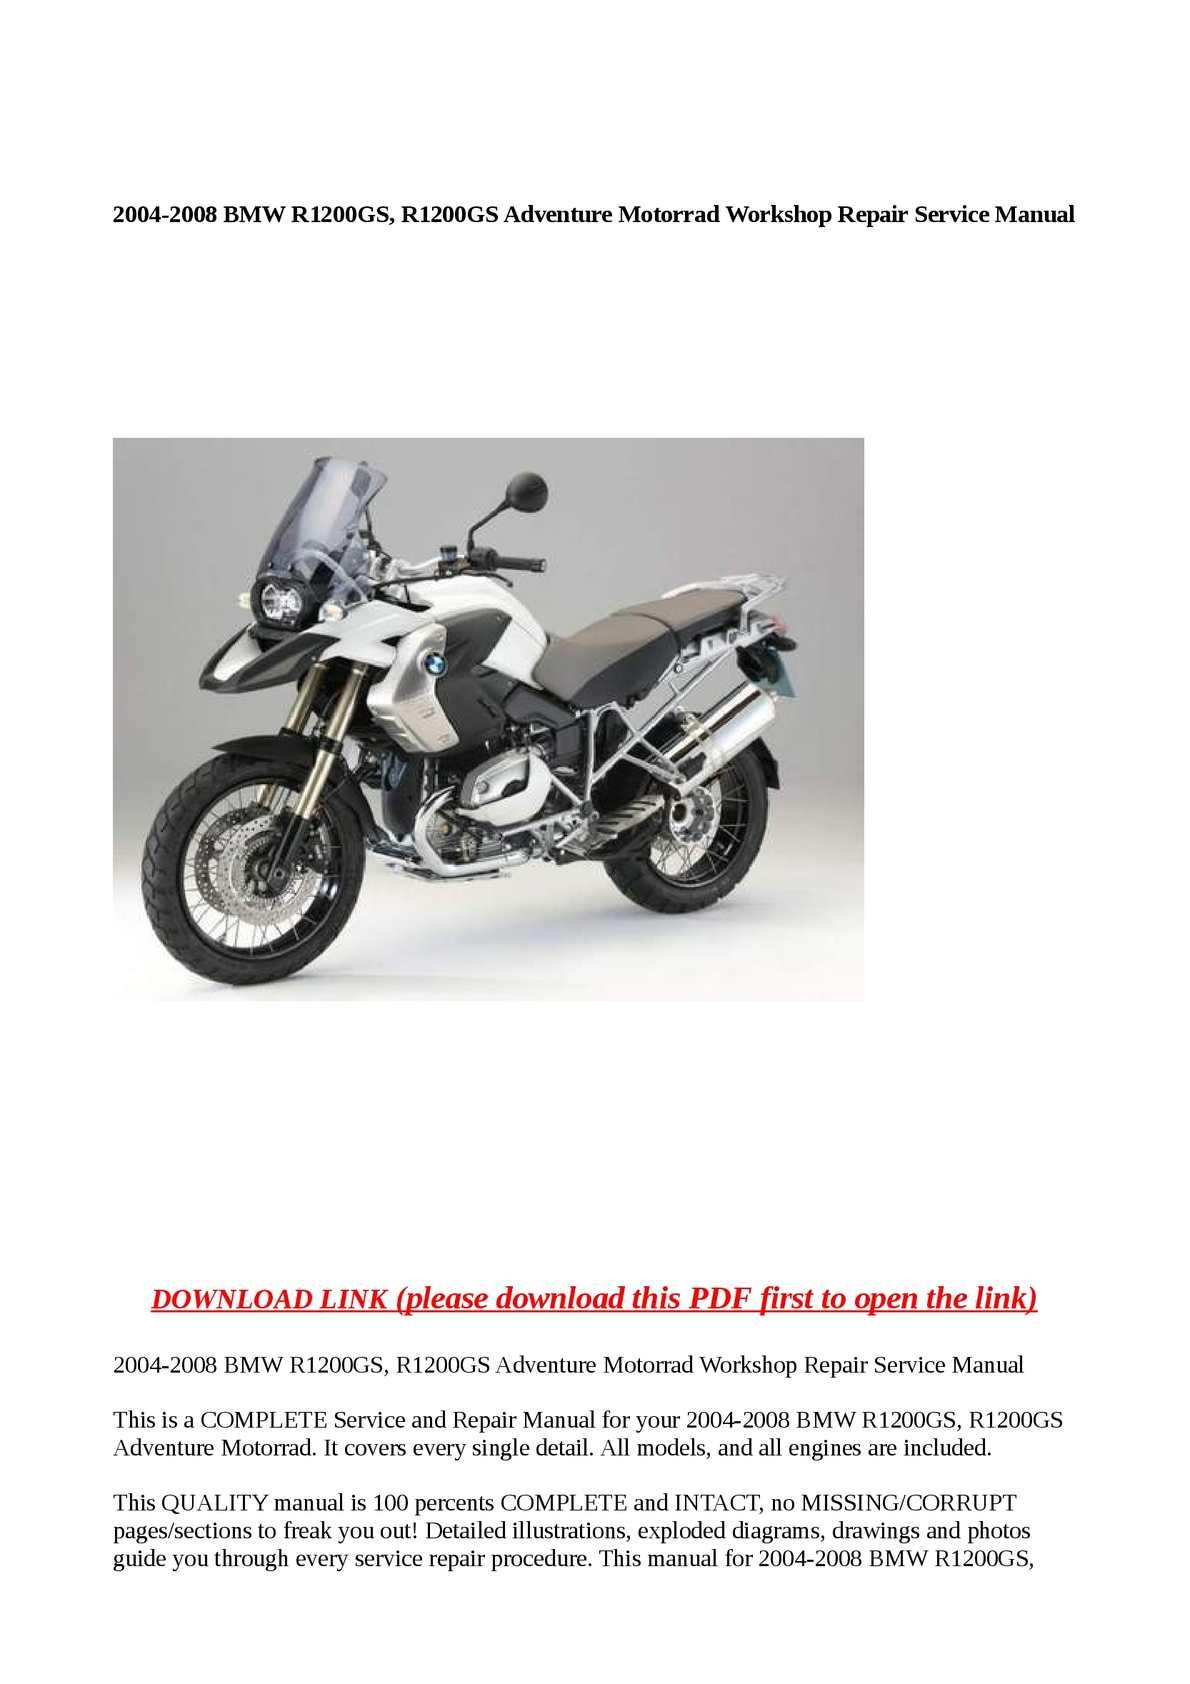 Calaméo - 2004-2008 BMW R1200GS, R1200GS Adventure Motorrad Workshop Repair  Service Manual